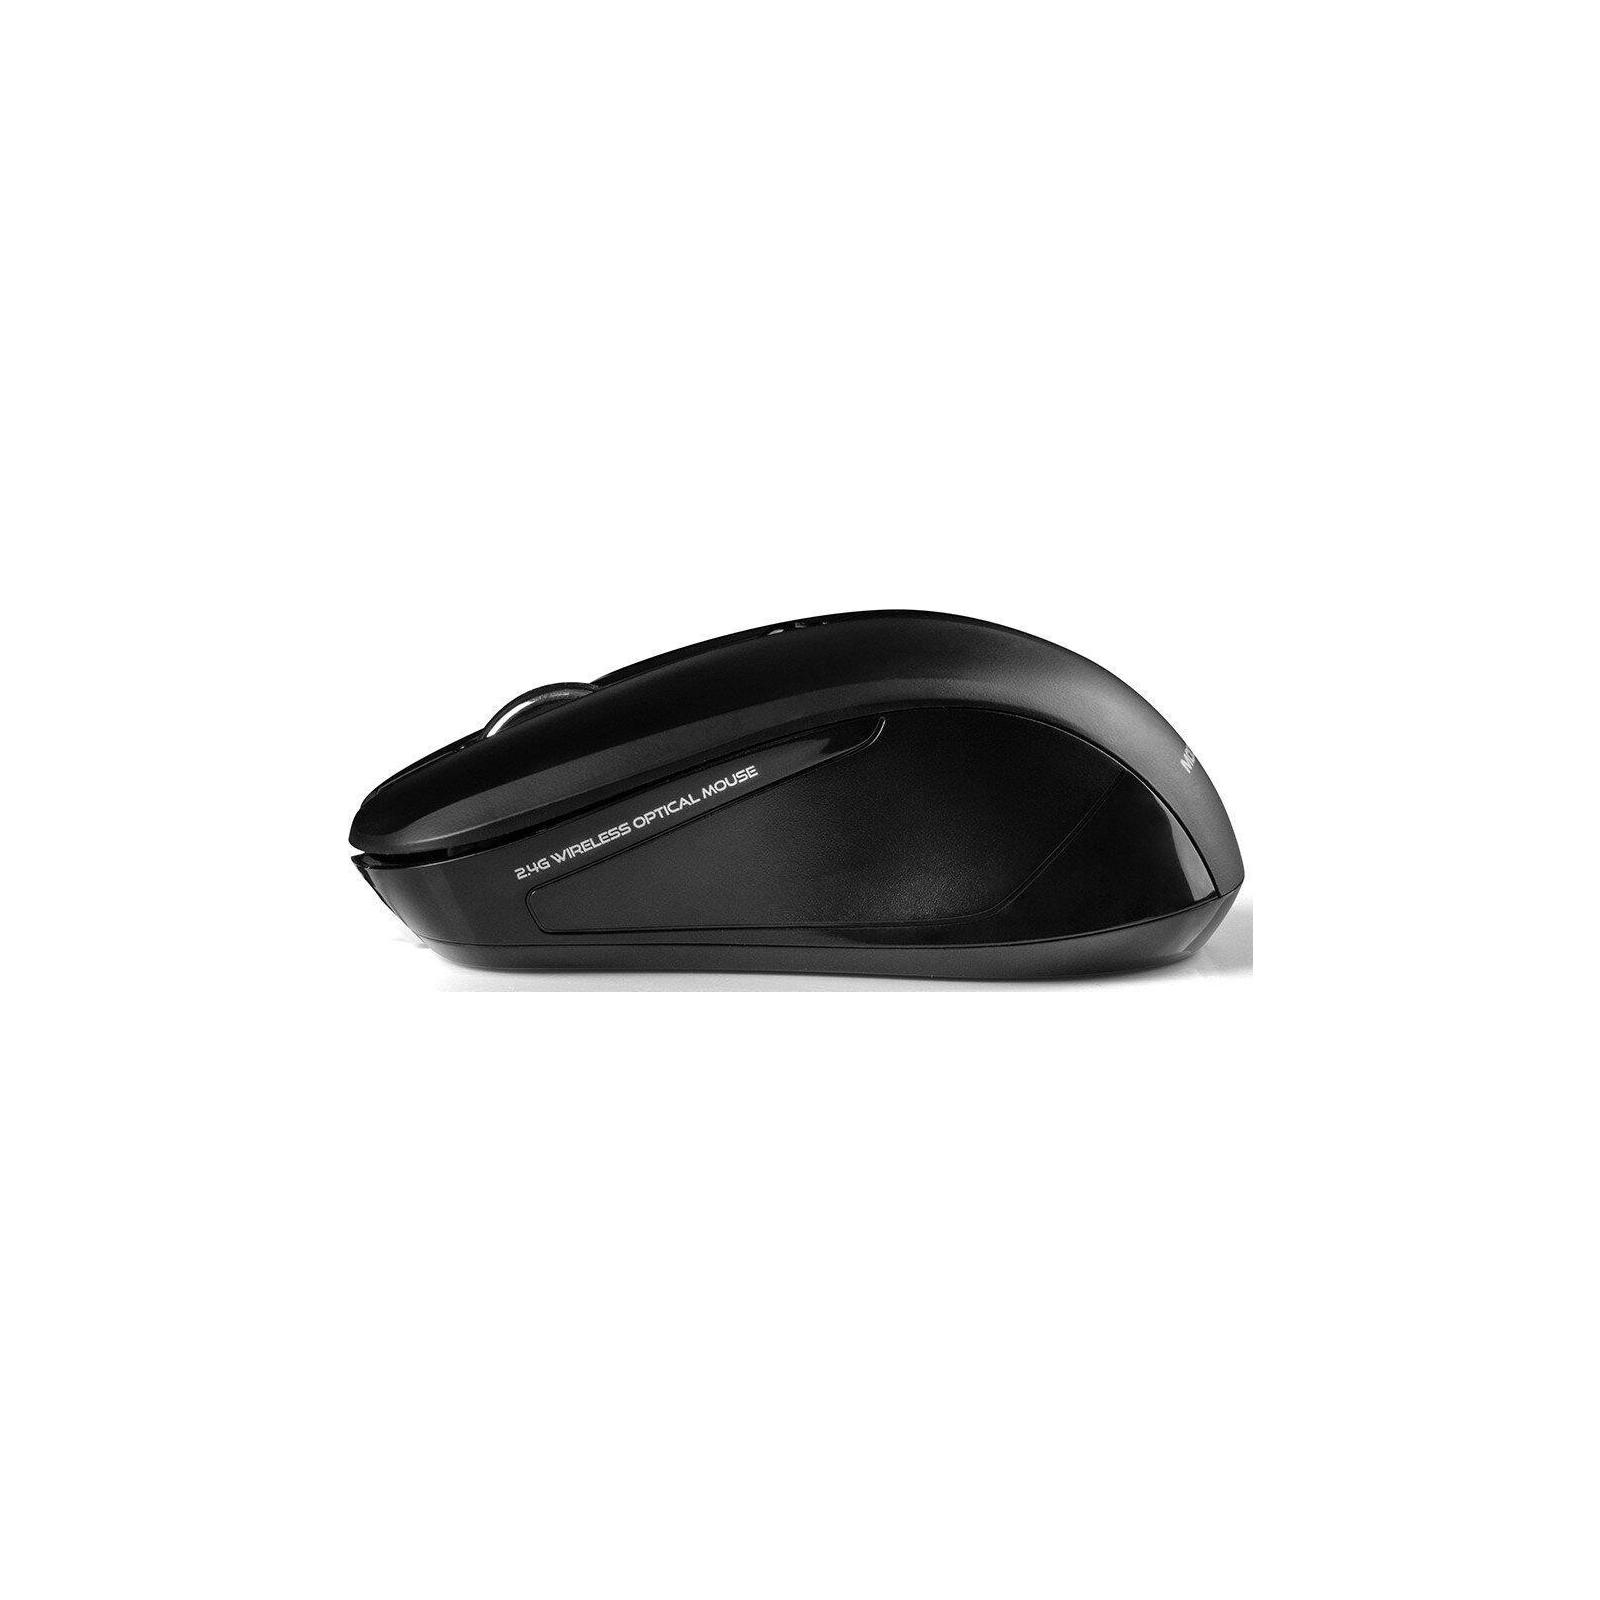 Мышка Modecom MC-M9.1 Wireless Black (M-MC-0WM9.1-100) изображение 2